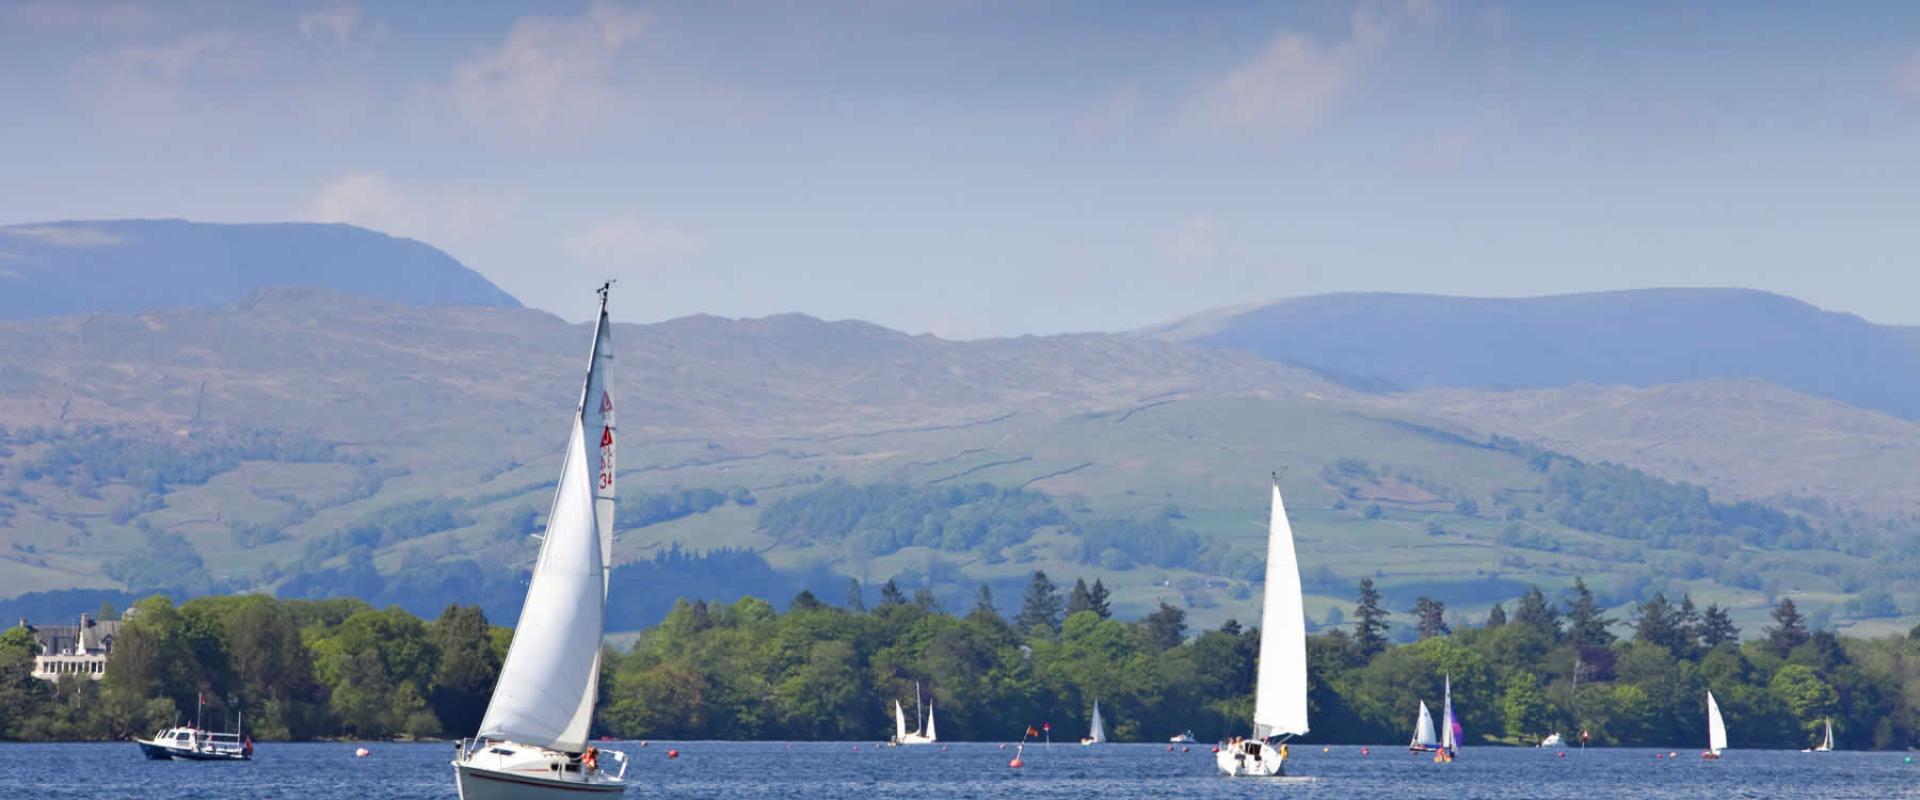 sailing lesson on trasimeno lake